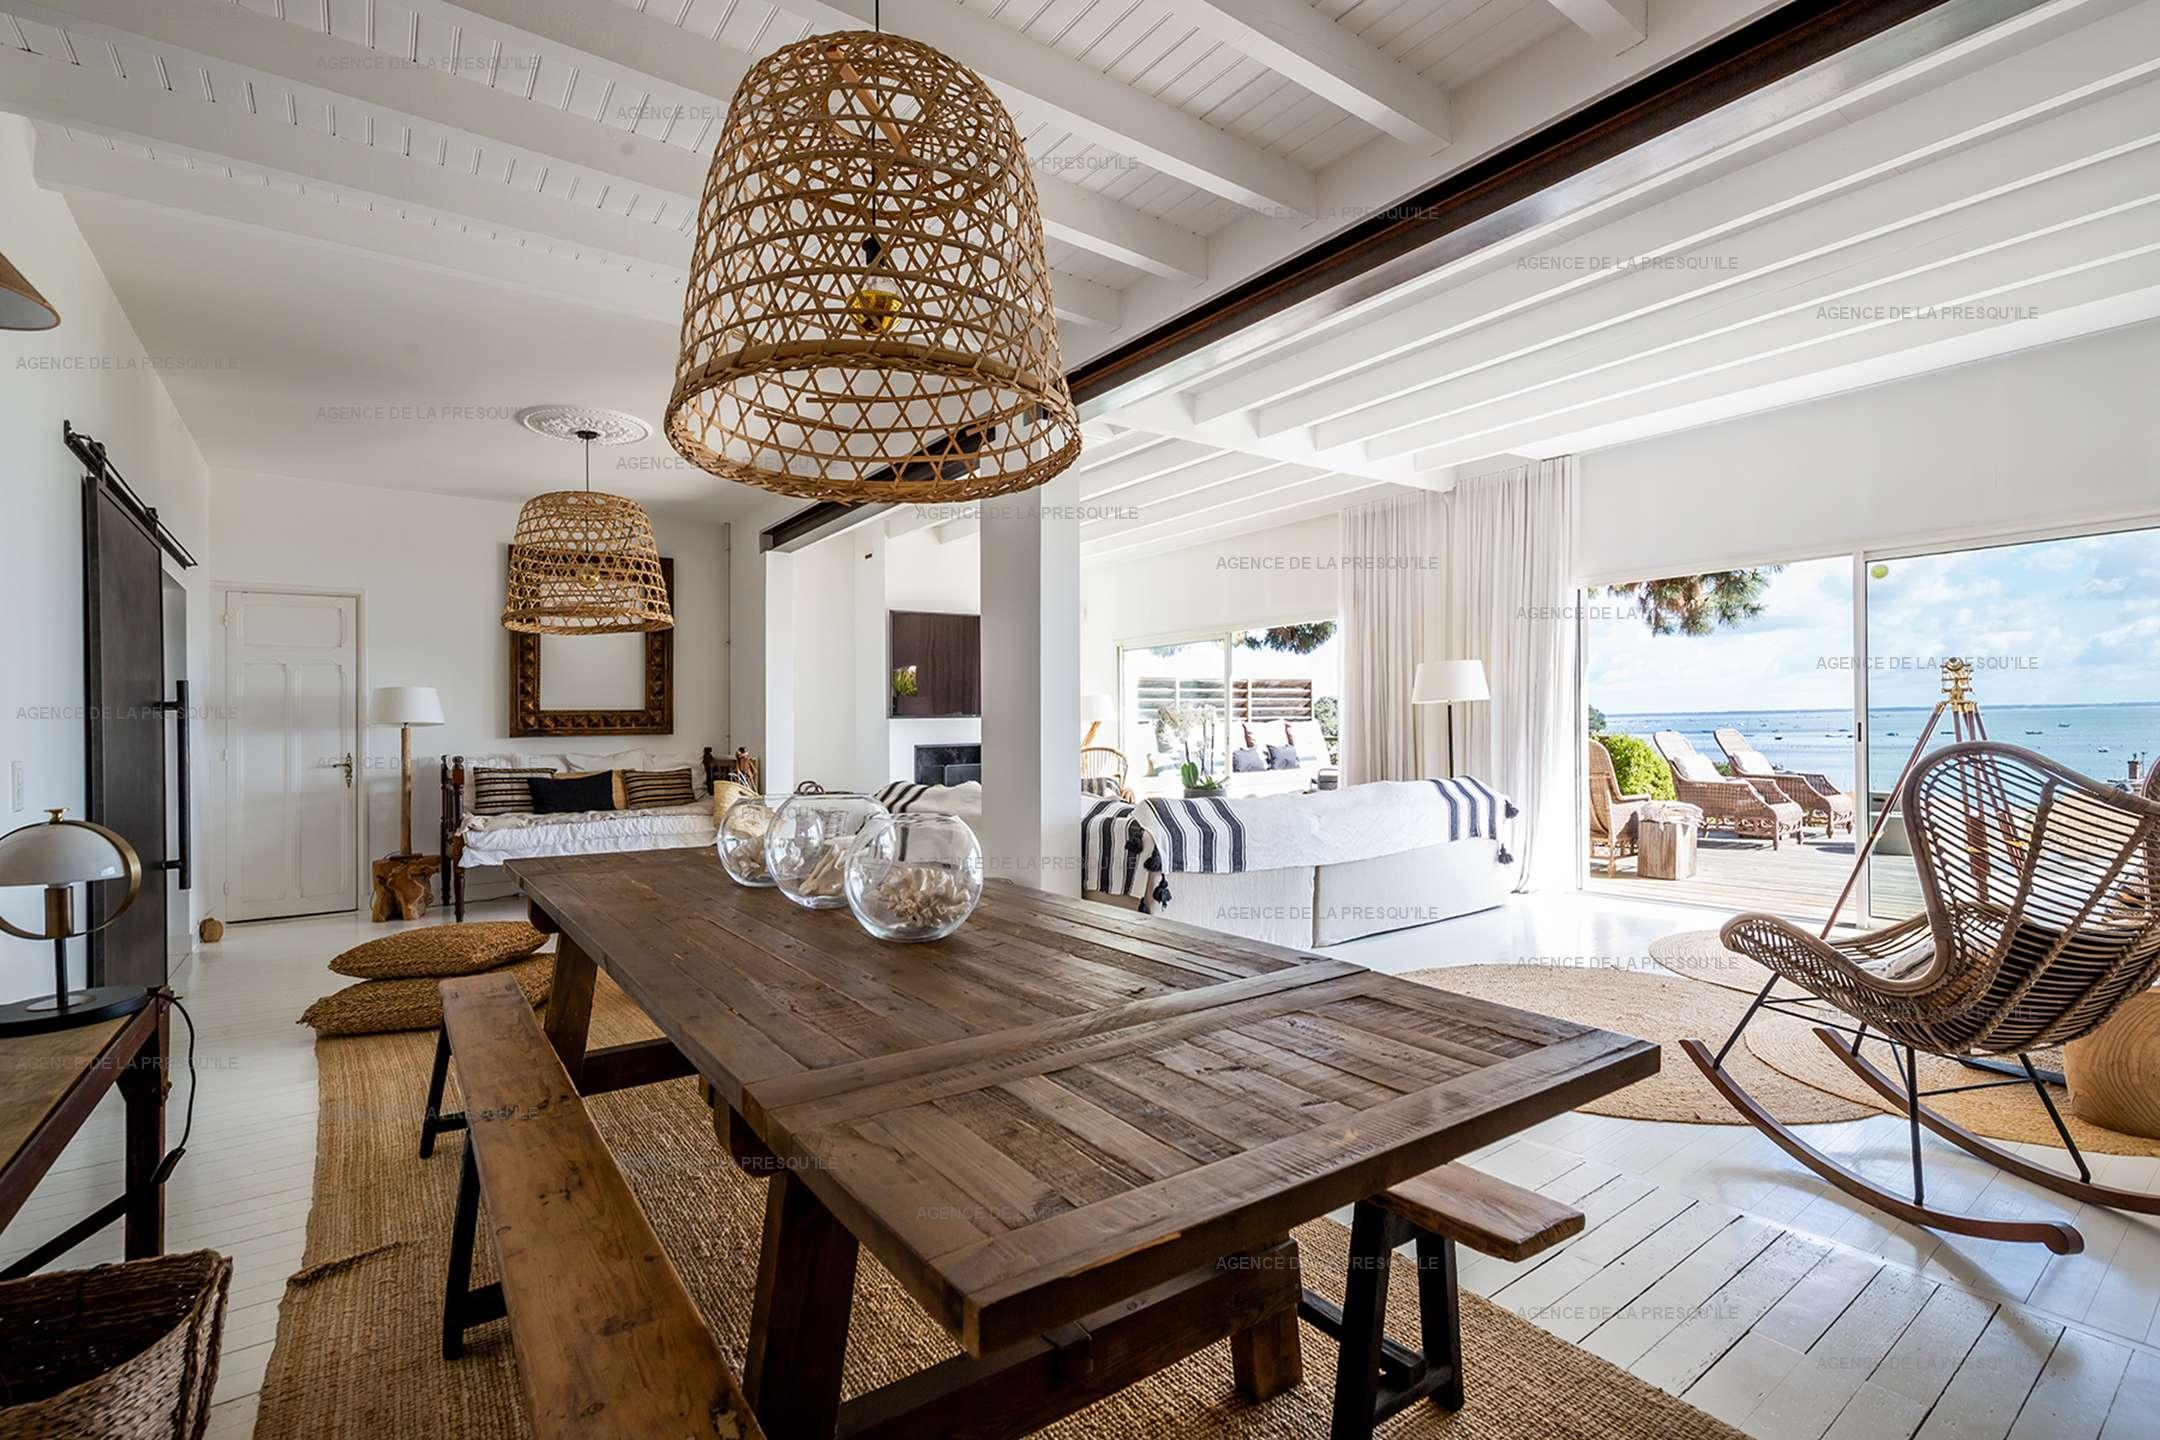 Location: Superbe villa avec vue bassin et piscine 5